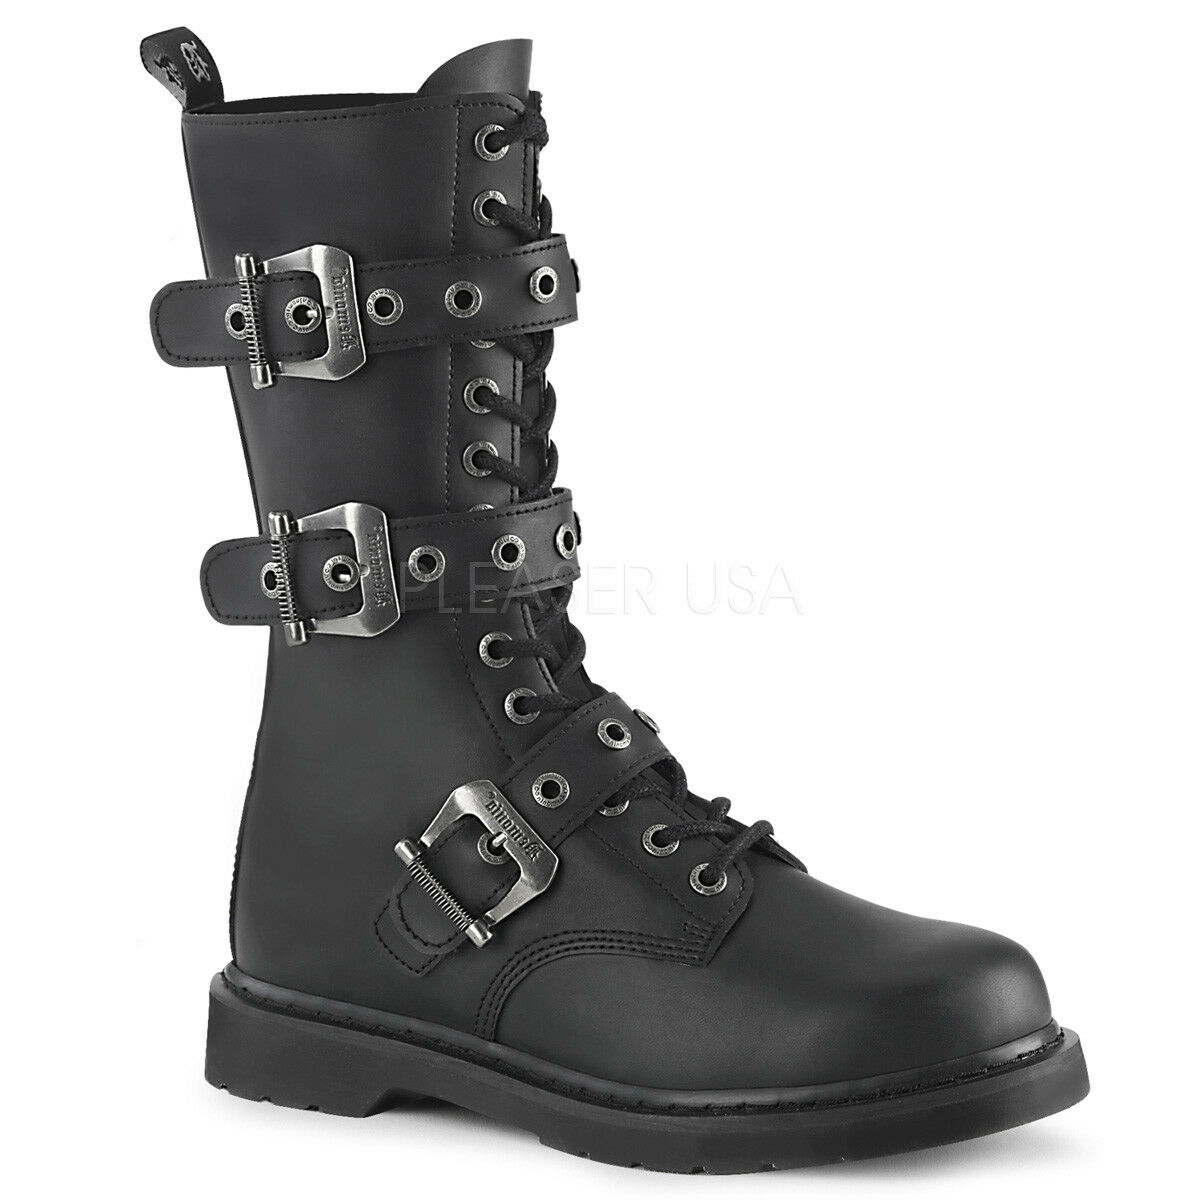 Demonia para Hombre Gotico Goth Punk Rock Biker Negro botas De Combate Perno - 330